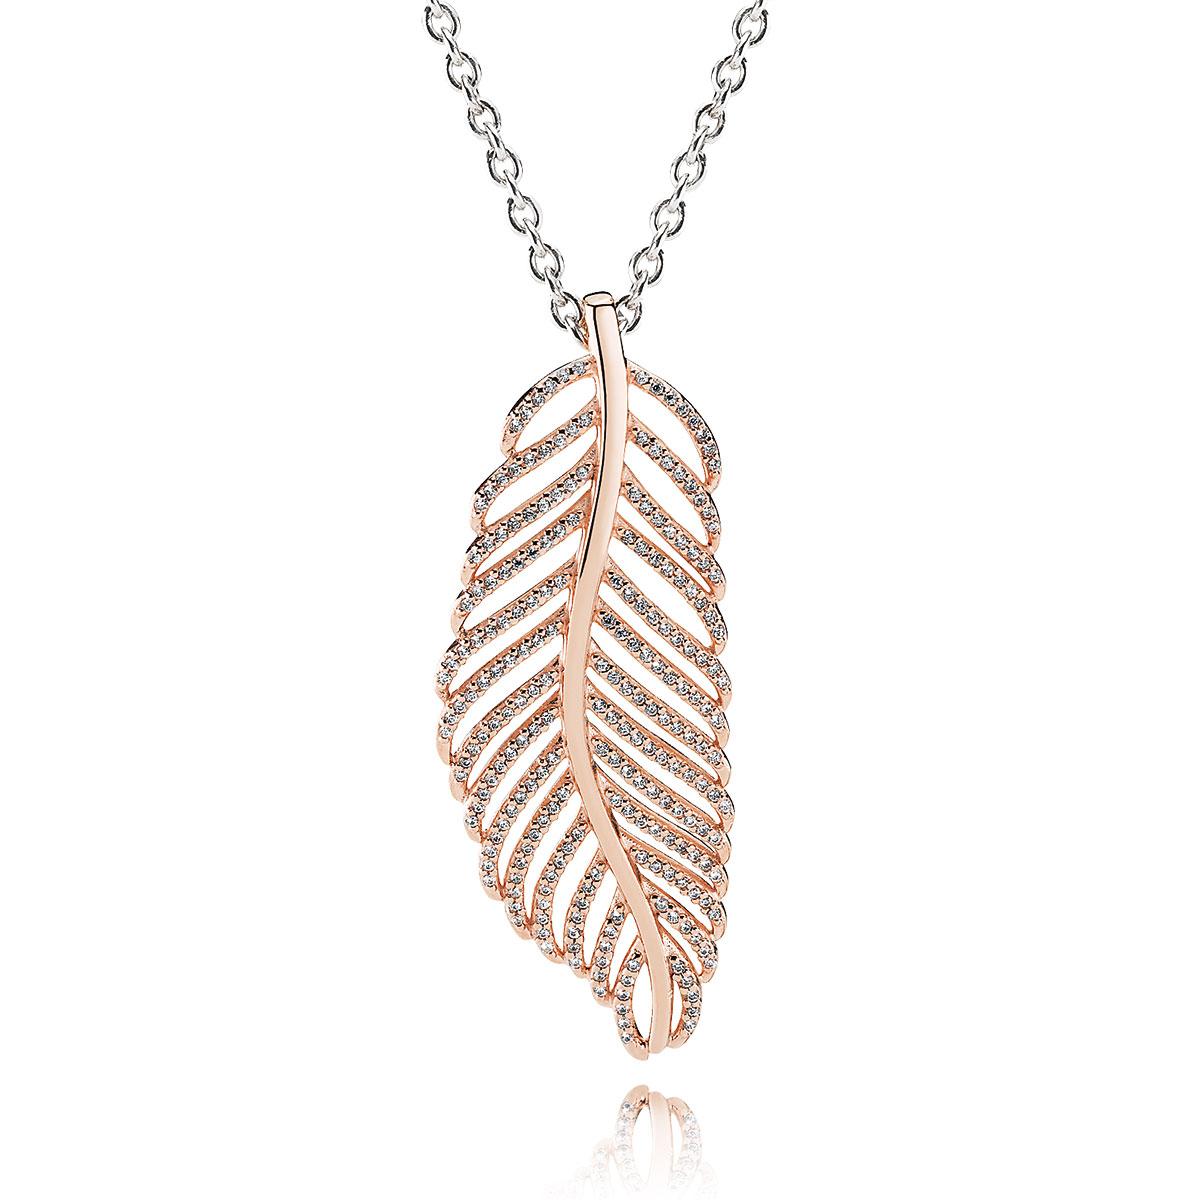 Pandora rose light as a feather pendant pancharmbracelets pandora rose light as a feather pendant on chain aloadofball Gallery